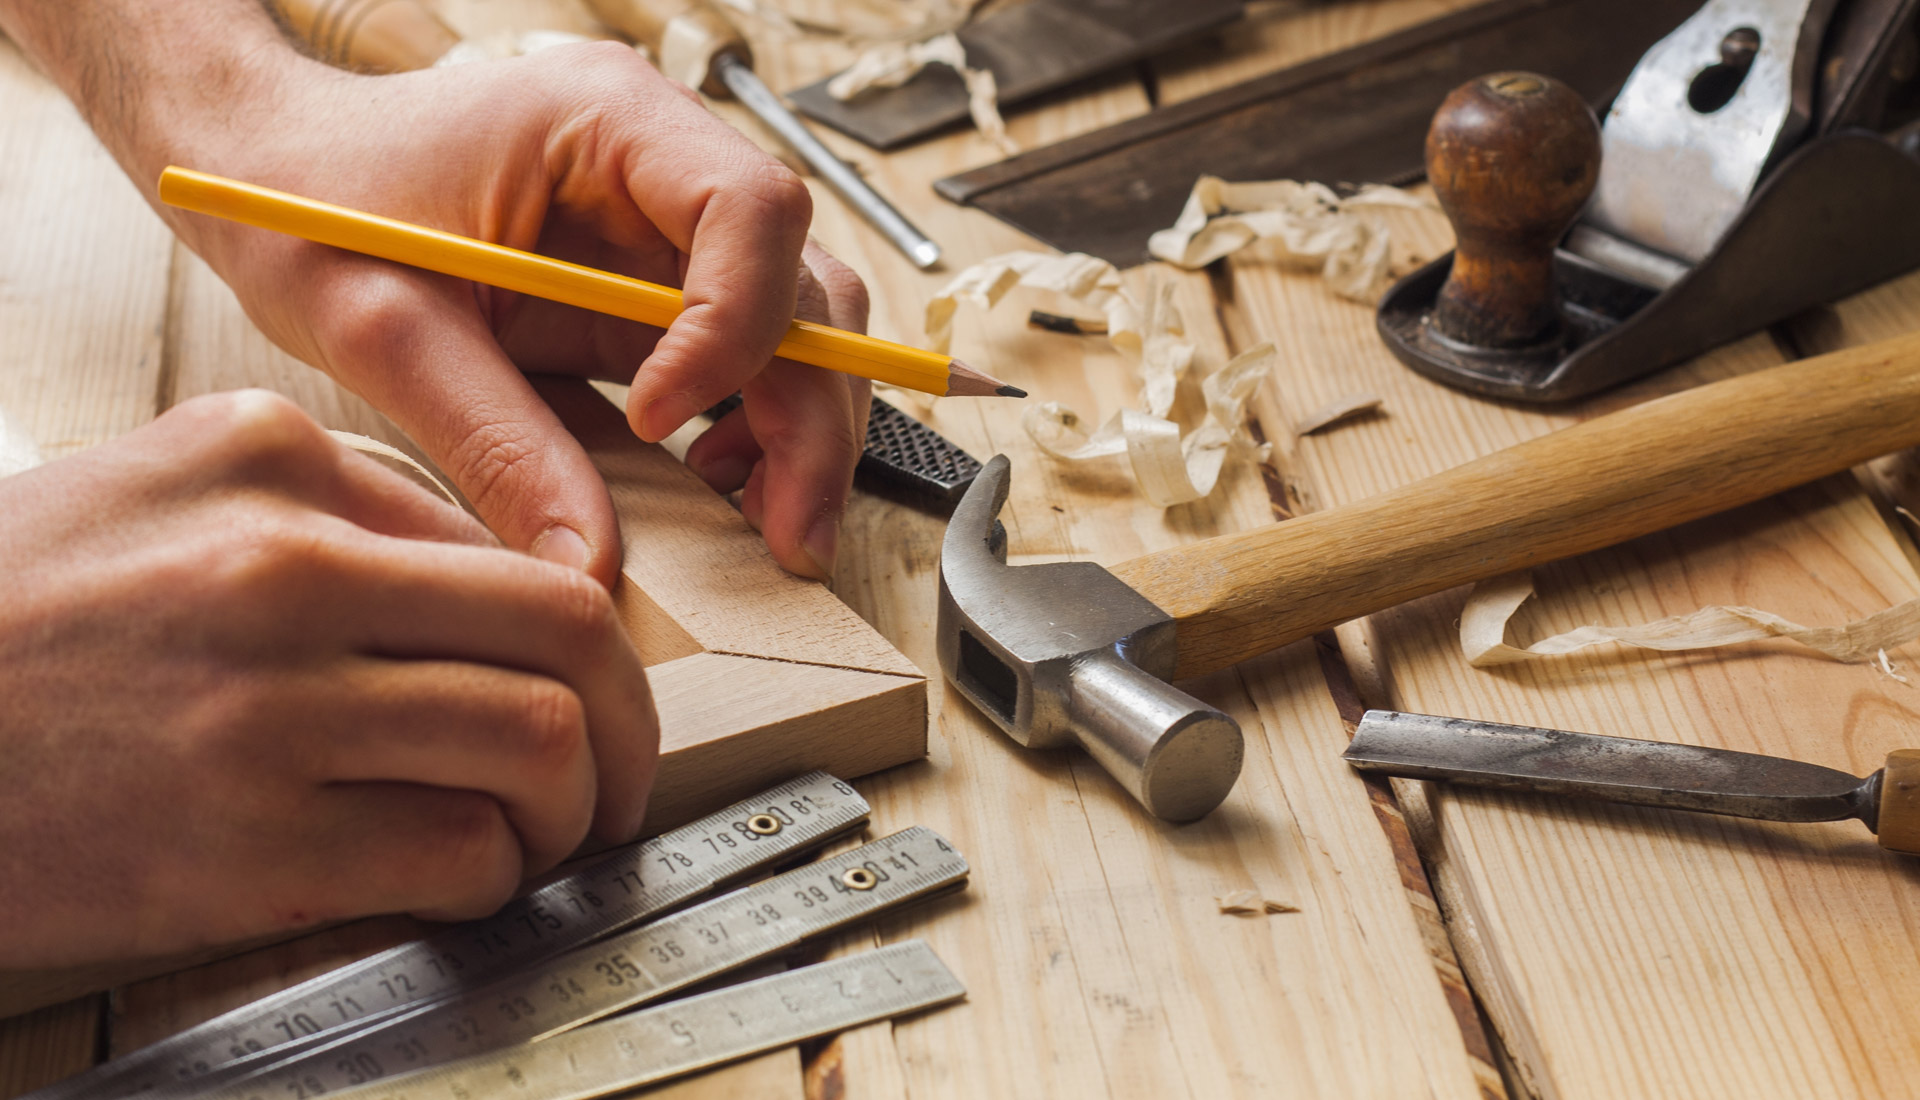 https://ruuddirckx.nl/wp-content/uploads/2019/09/carpentry-by-rob.jpg